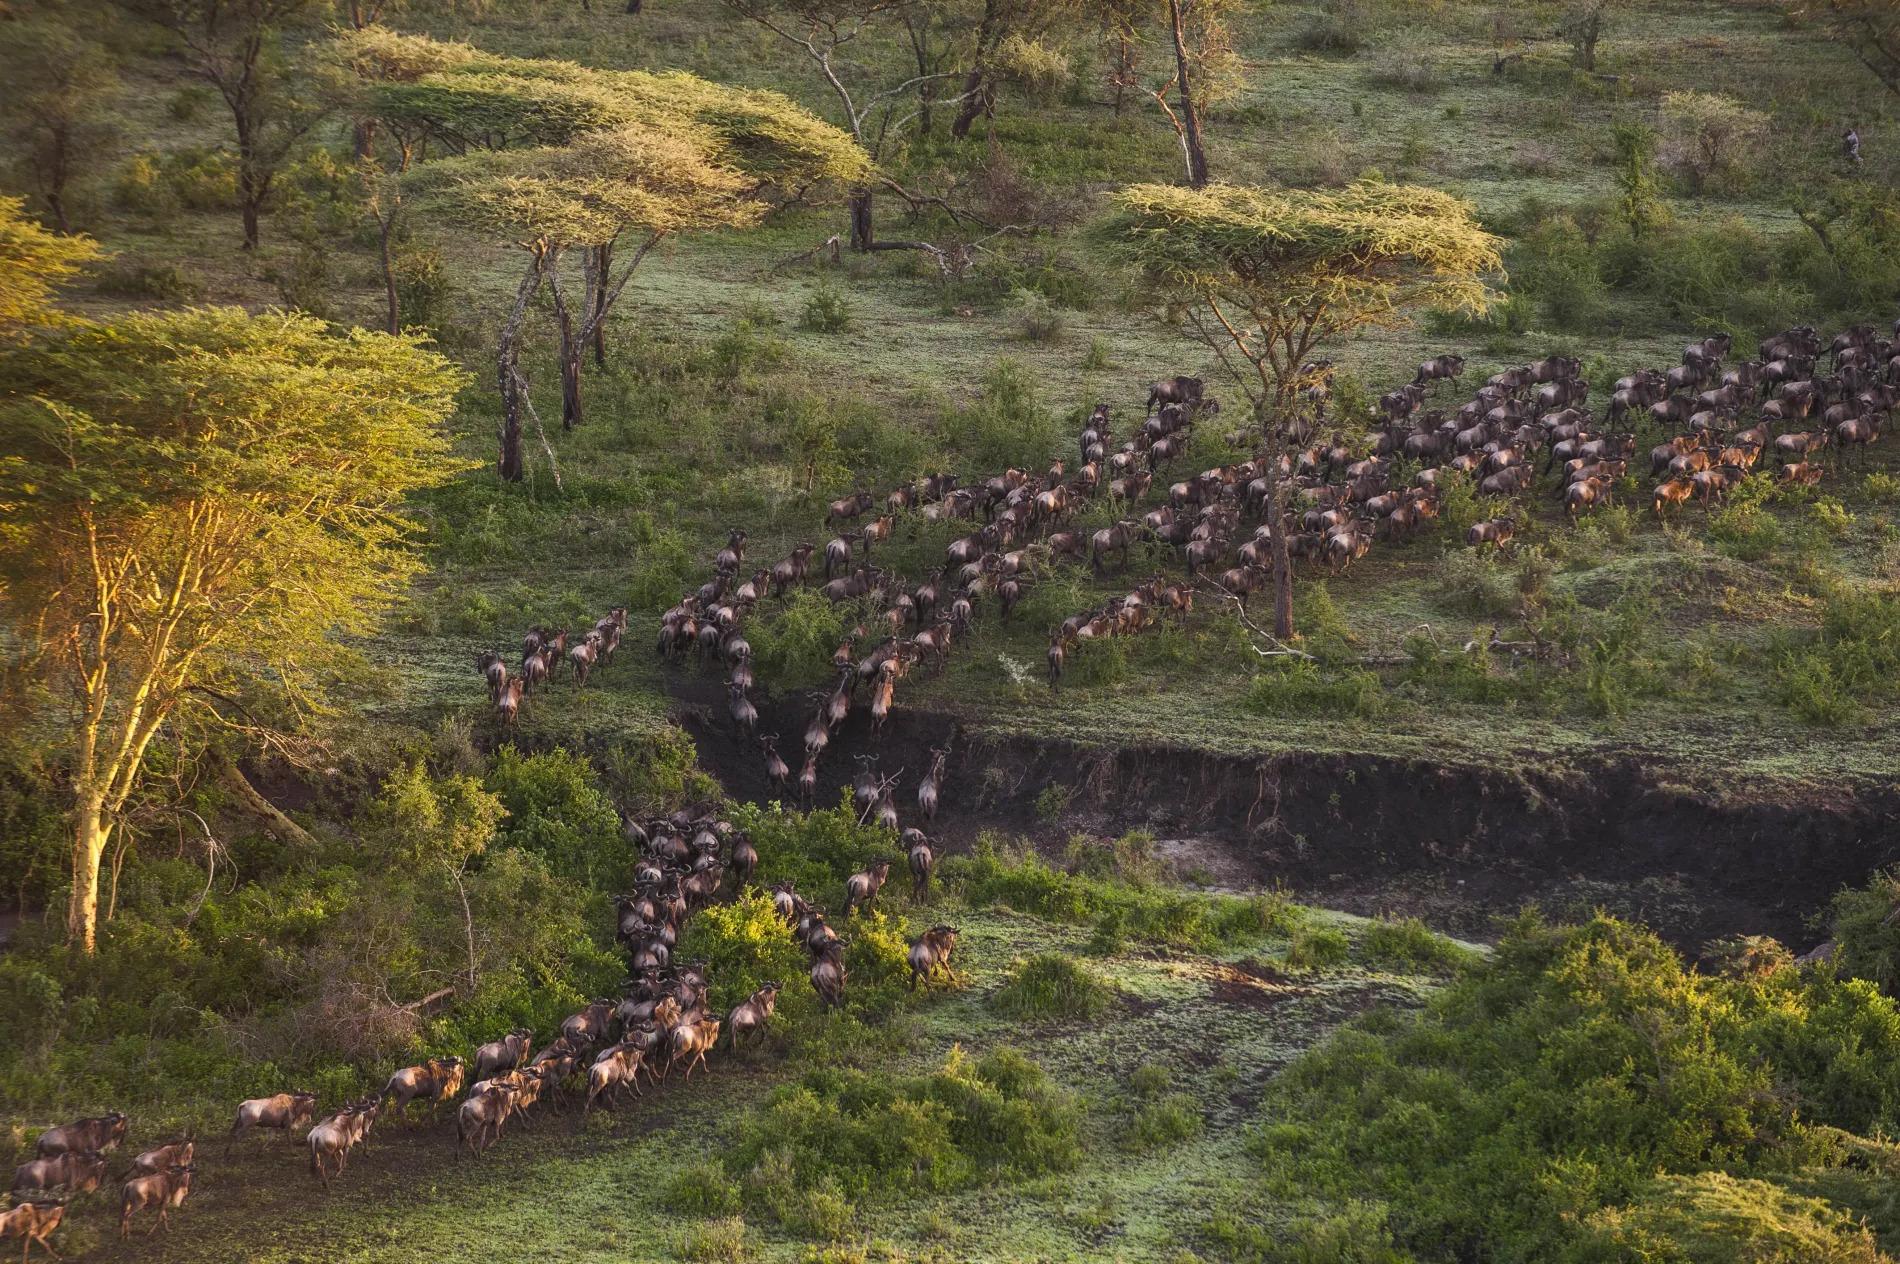 Mwiba Migration